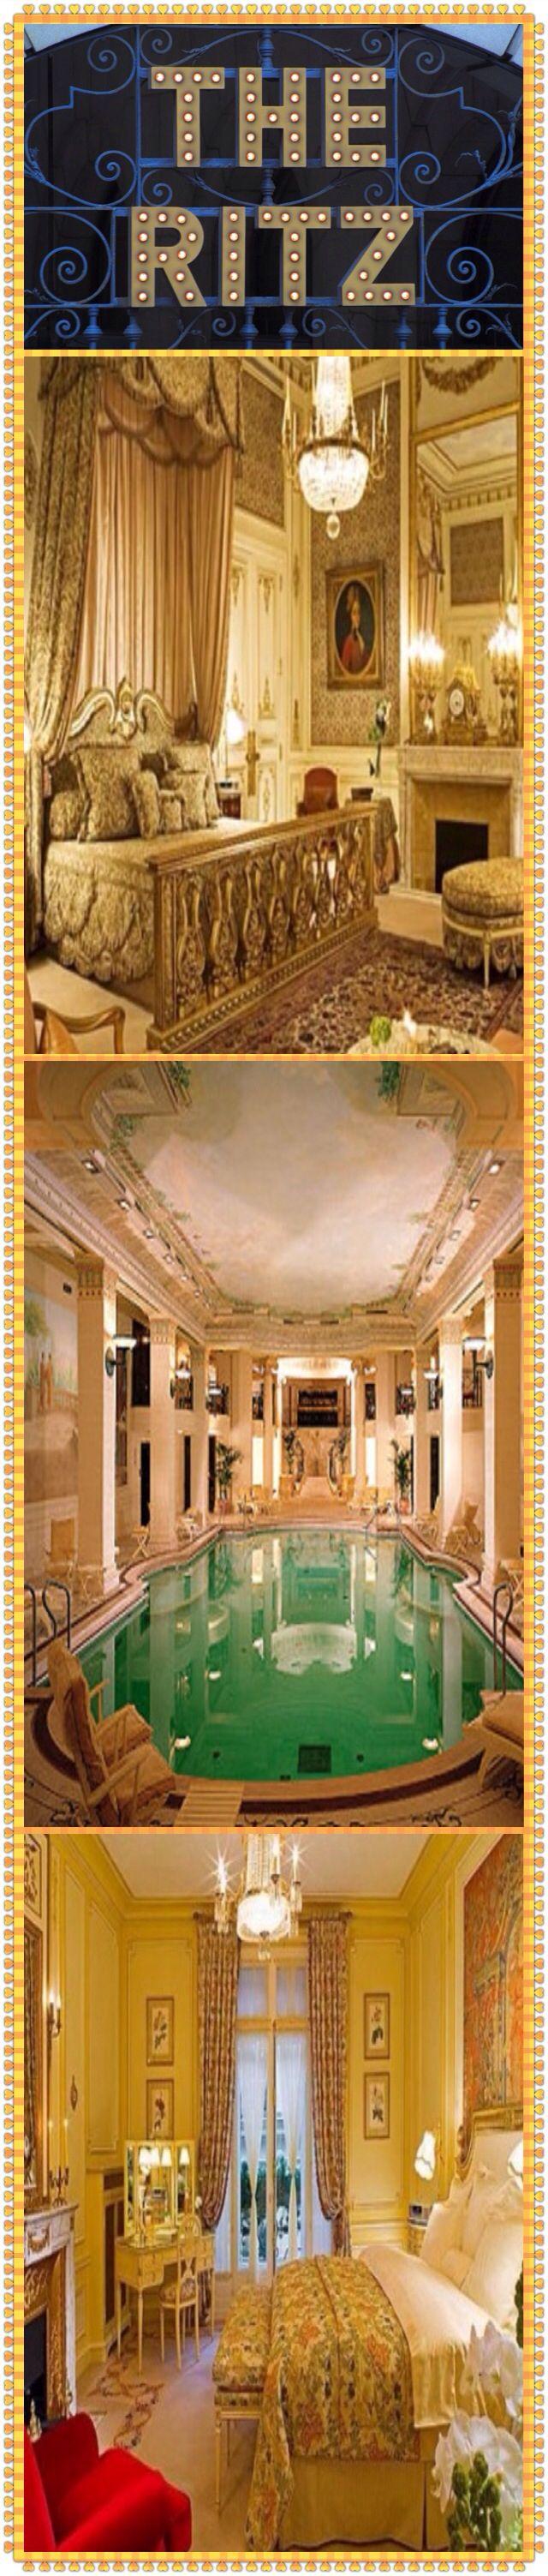 San Francisco Map Ritz Carlton%0A Luxury at The Ritz Carlton Hotel